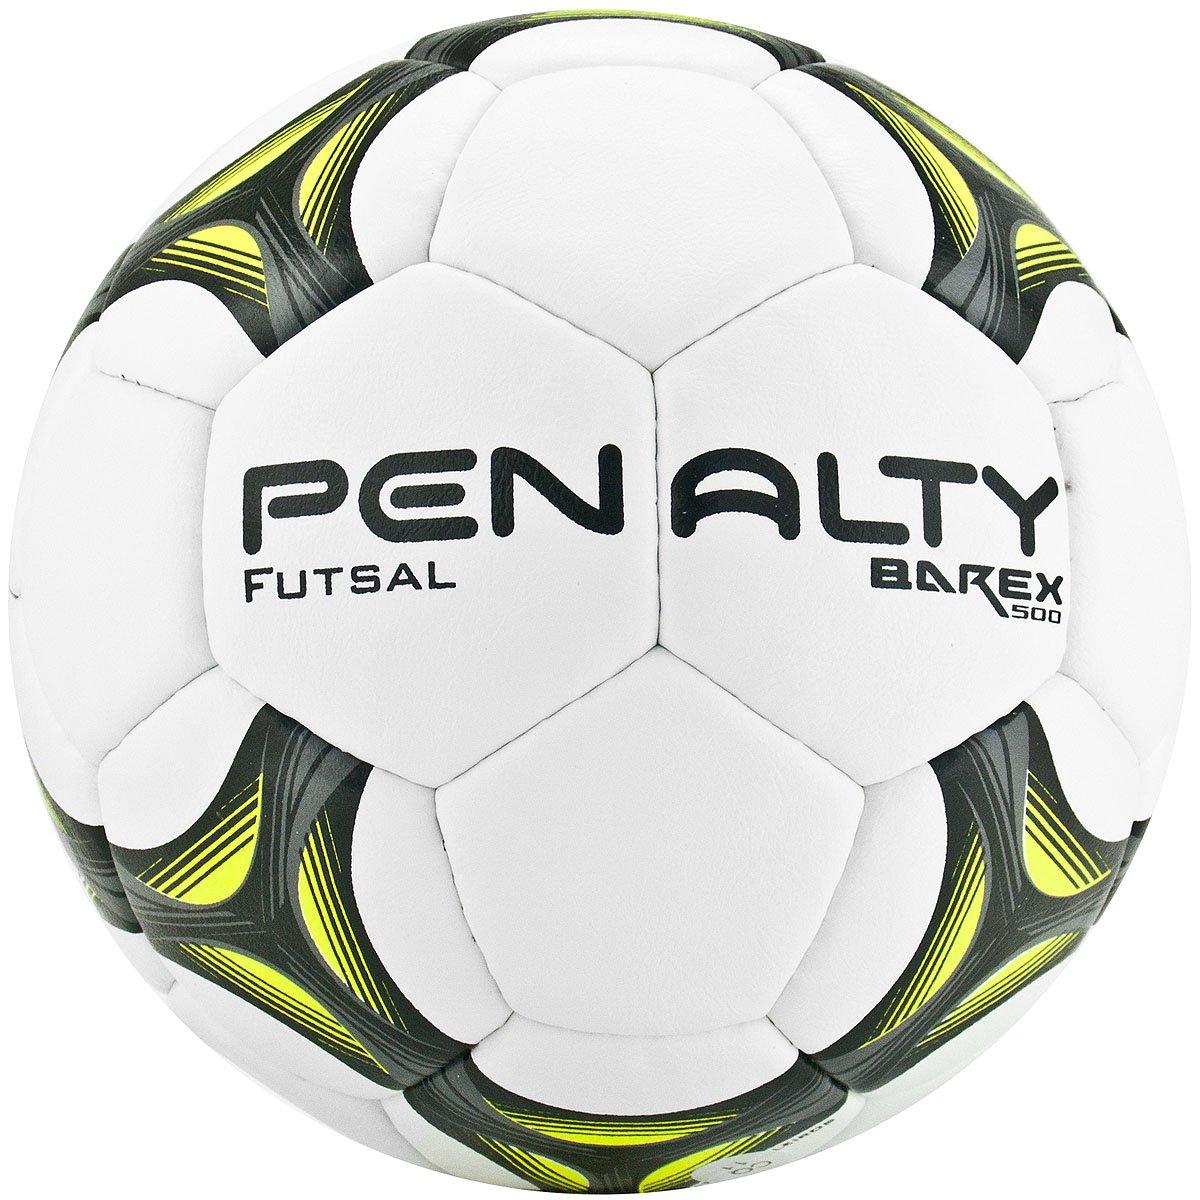 a69abd485a02c Bola Penalty Futsal Barex 500 VII